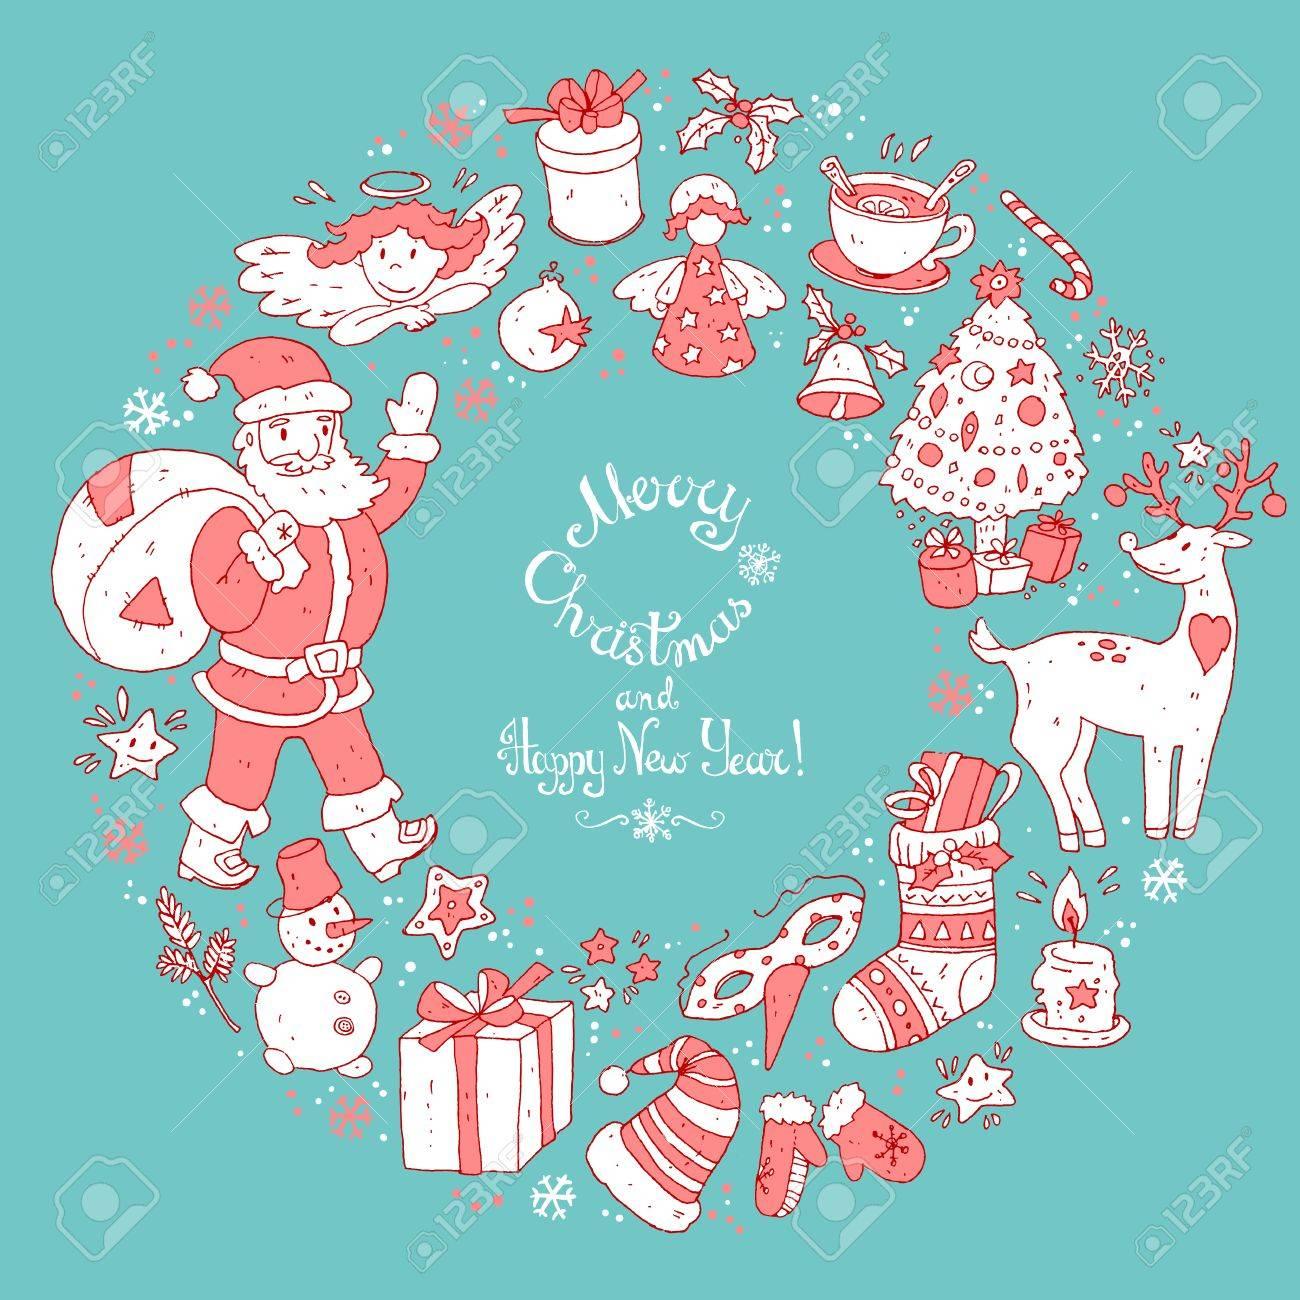 Vector circular wreath christmas greeting card template merry vector circular wreath christmas greeting card template merry christmas and happy new year m4hsunfo Gallery